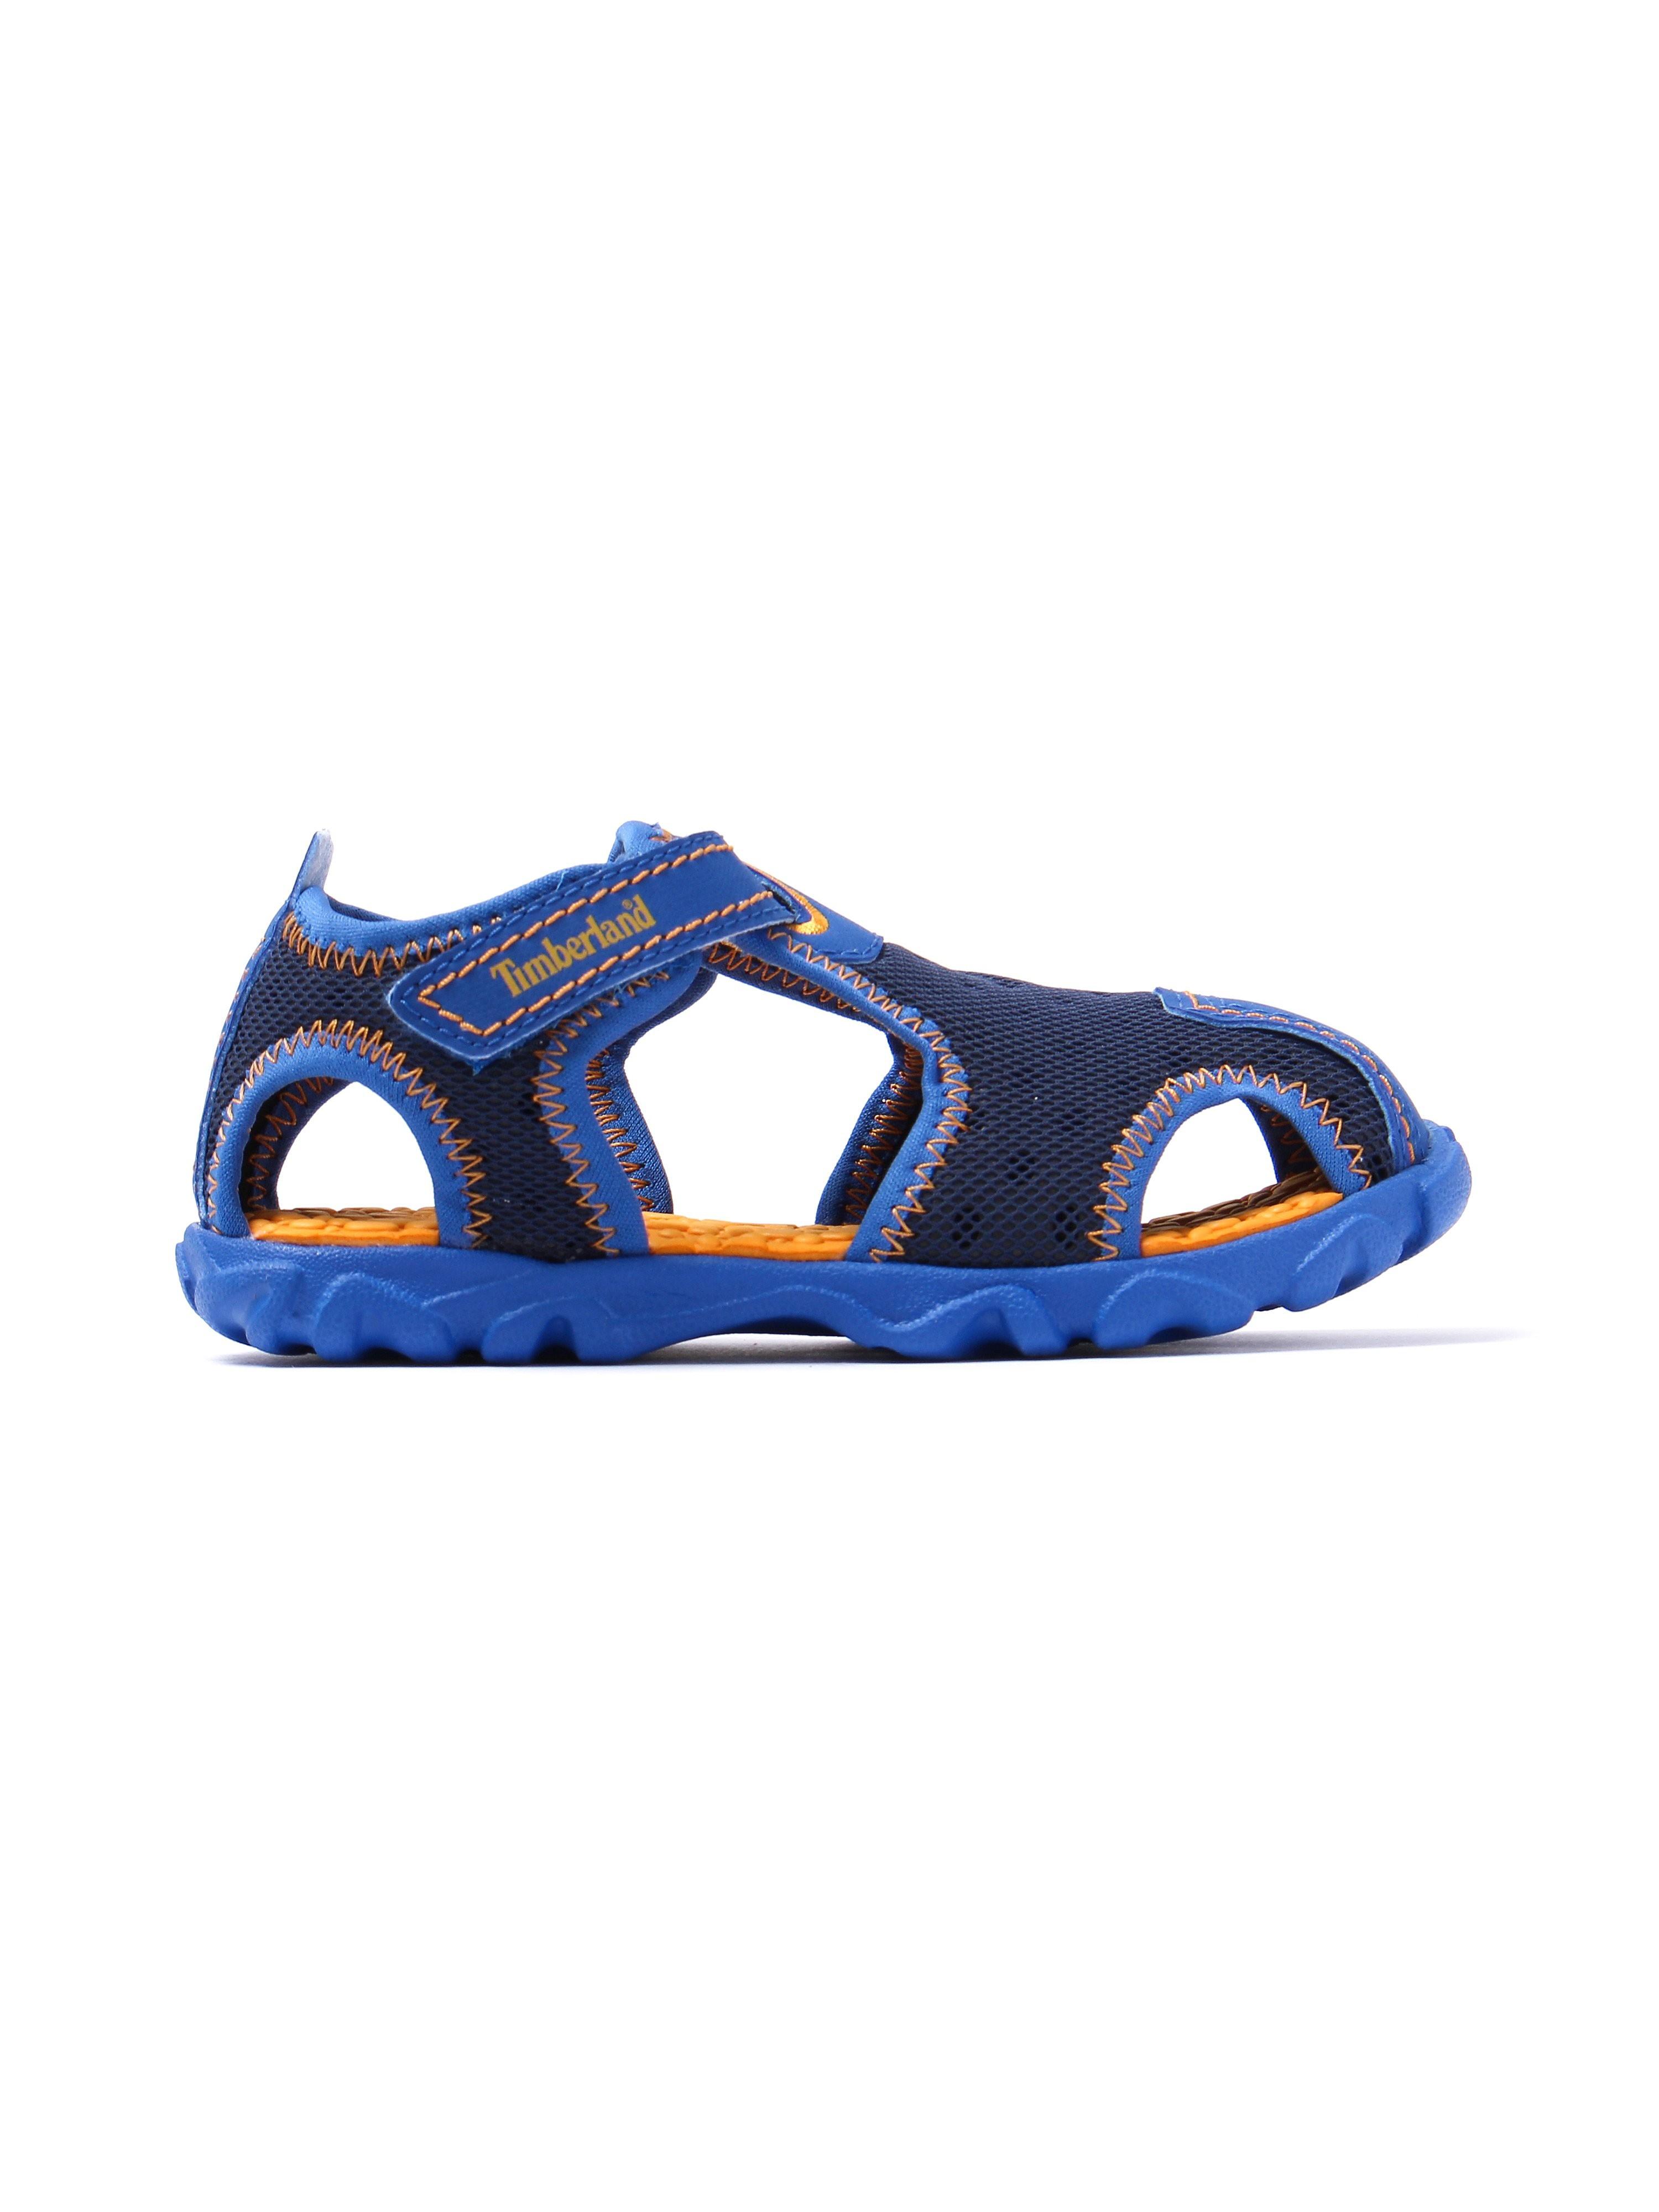 Timberland Infant Splashtown Fisherman Sandals - Blue & Orange